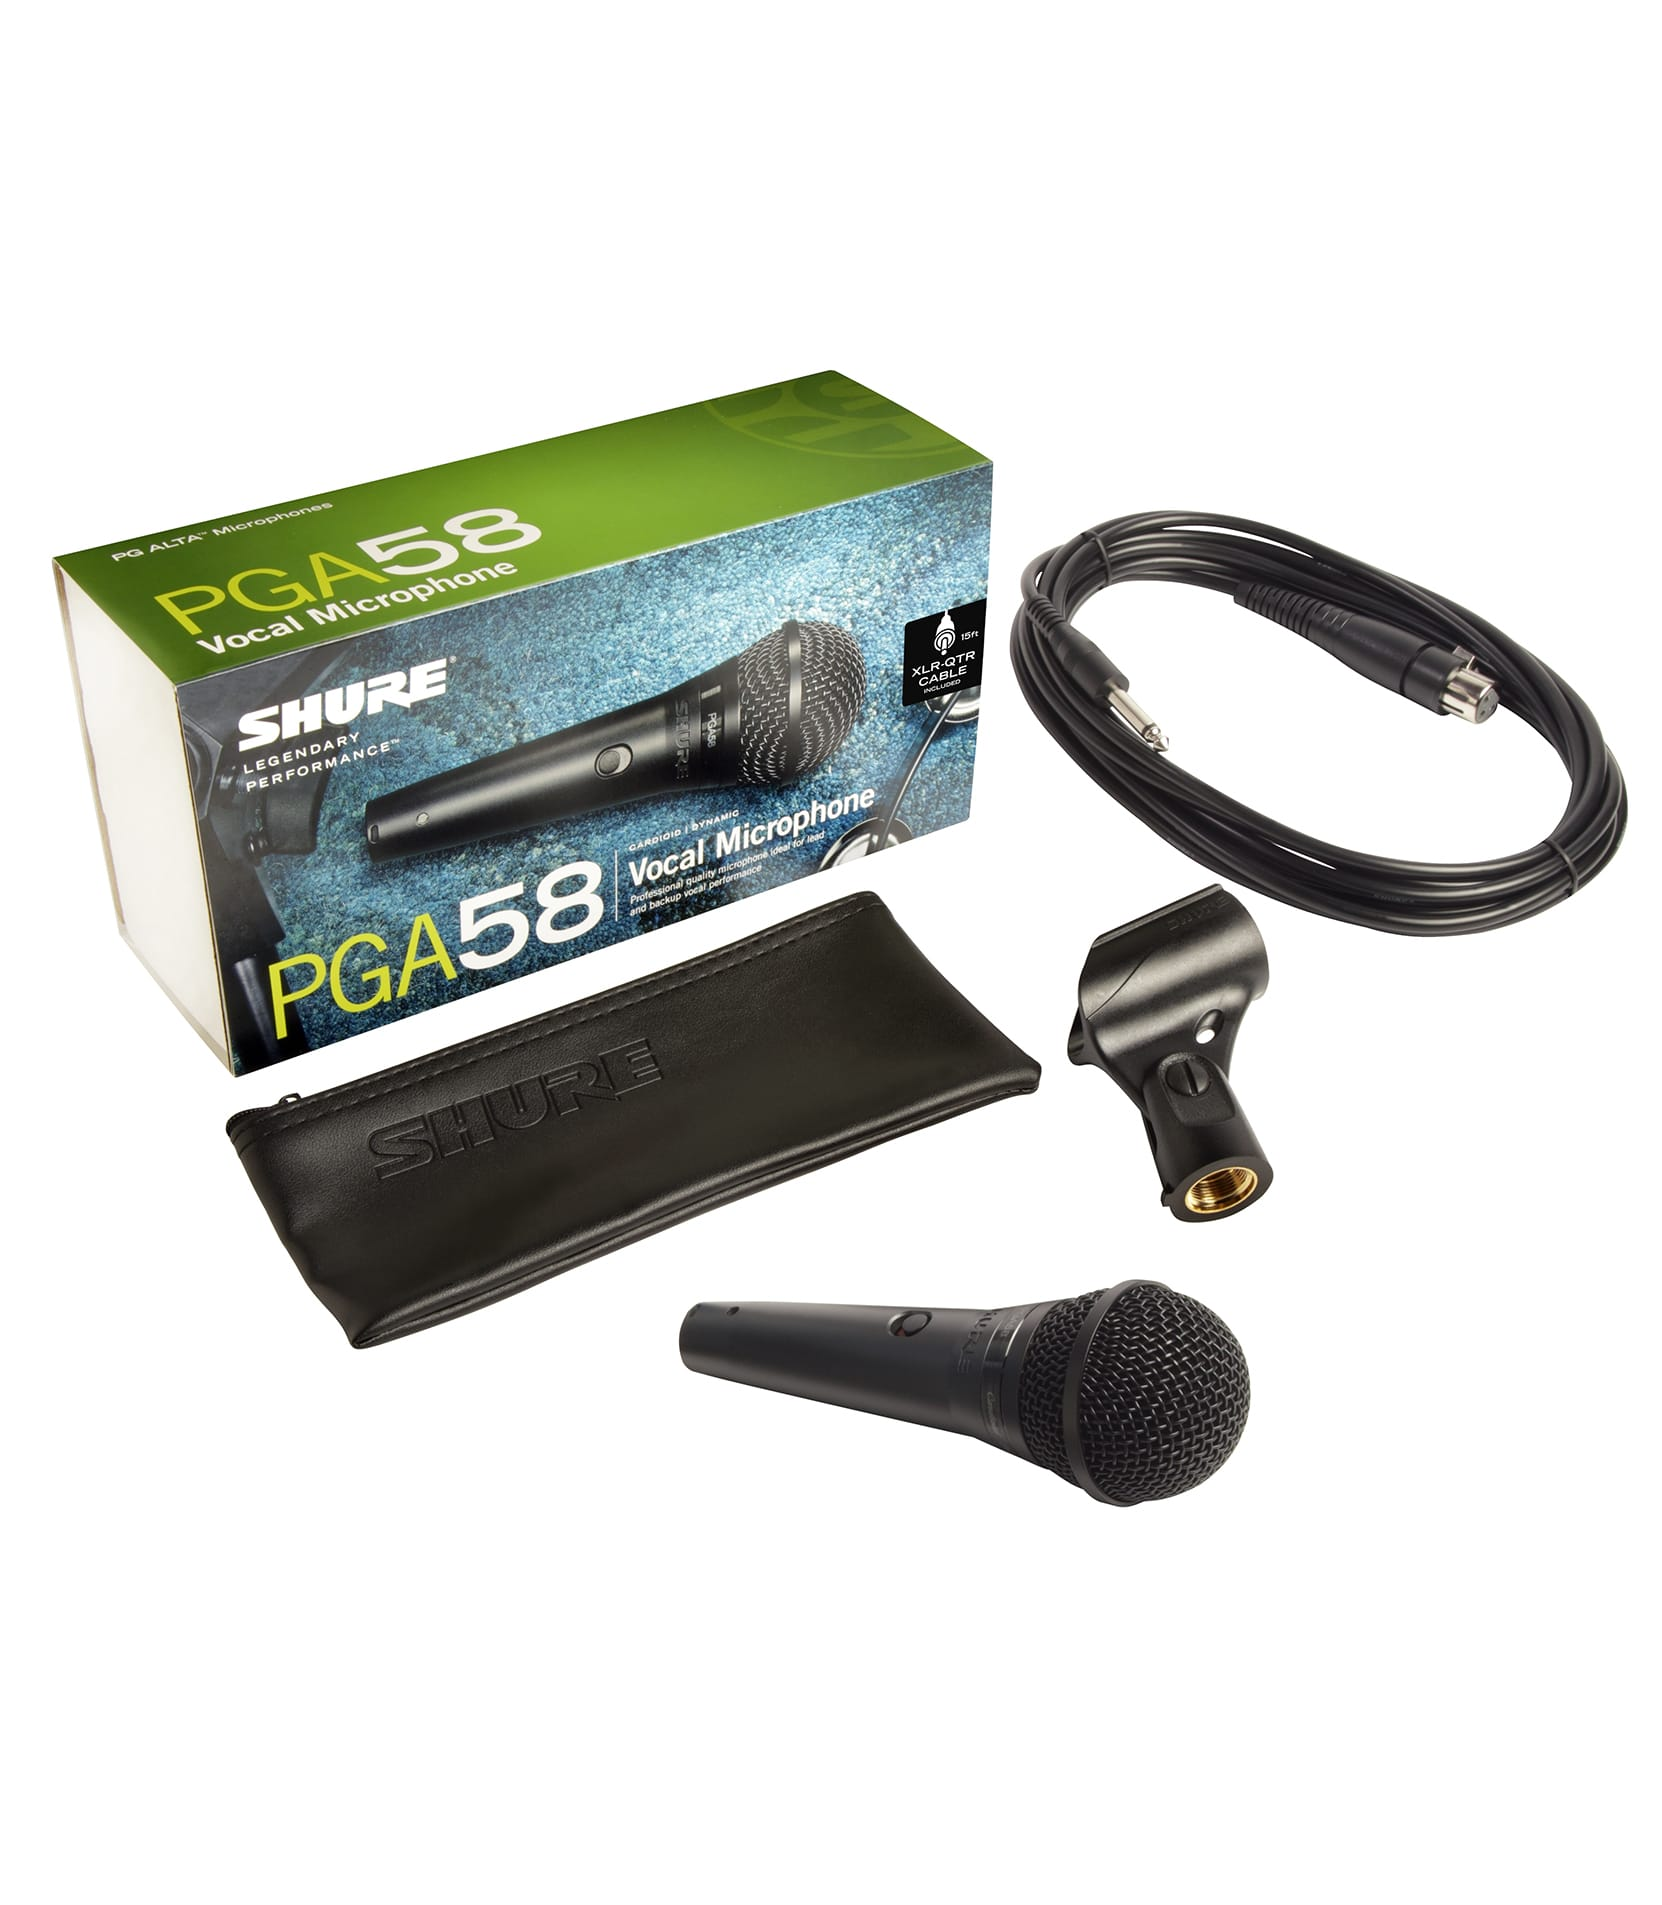 PGA58 QTR E - Buy Online